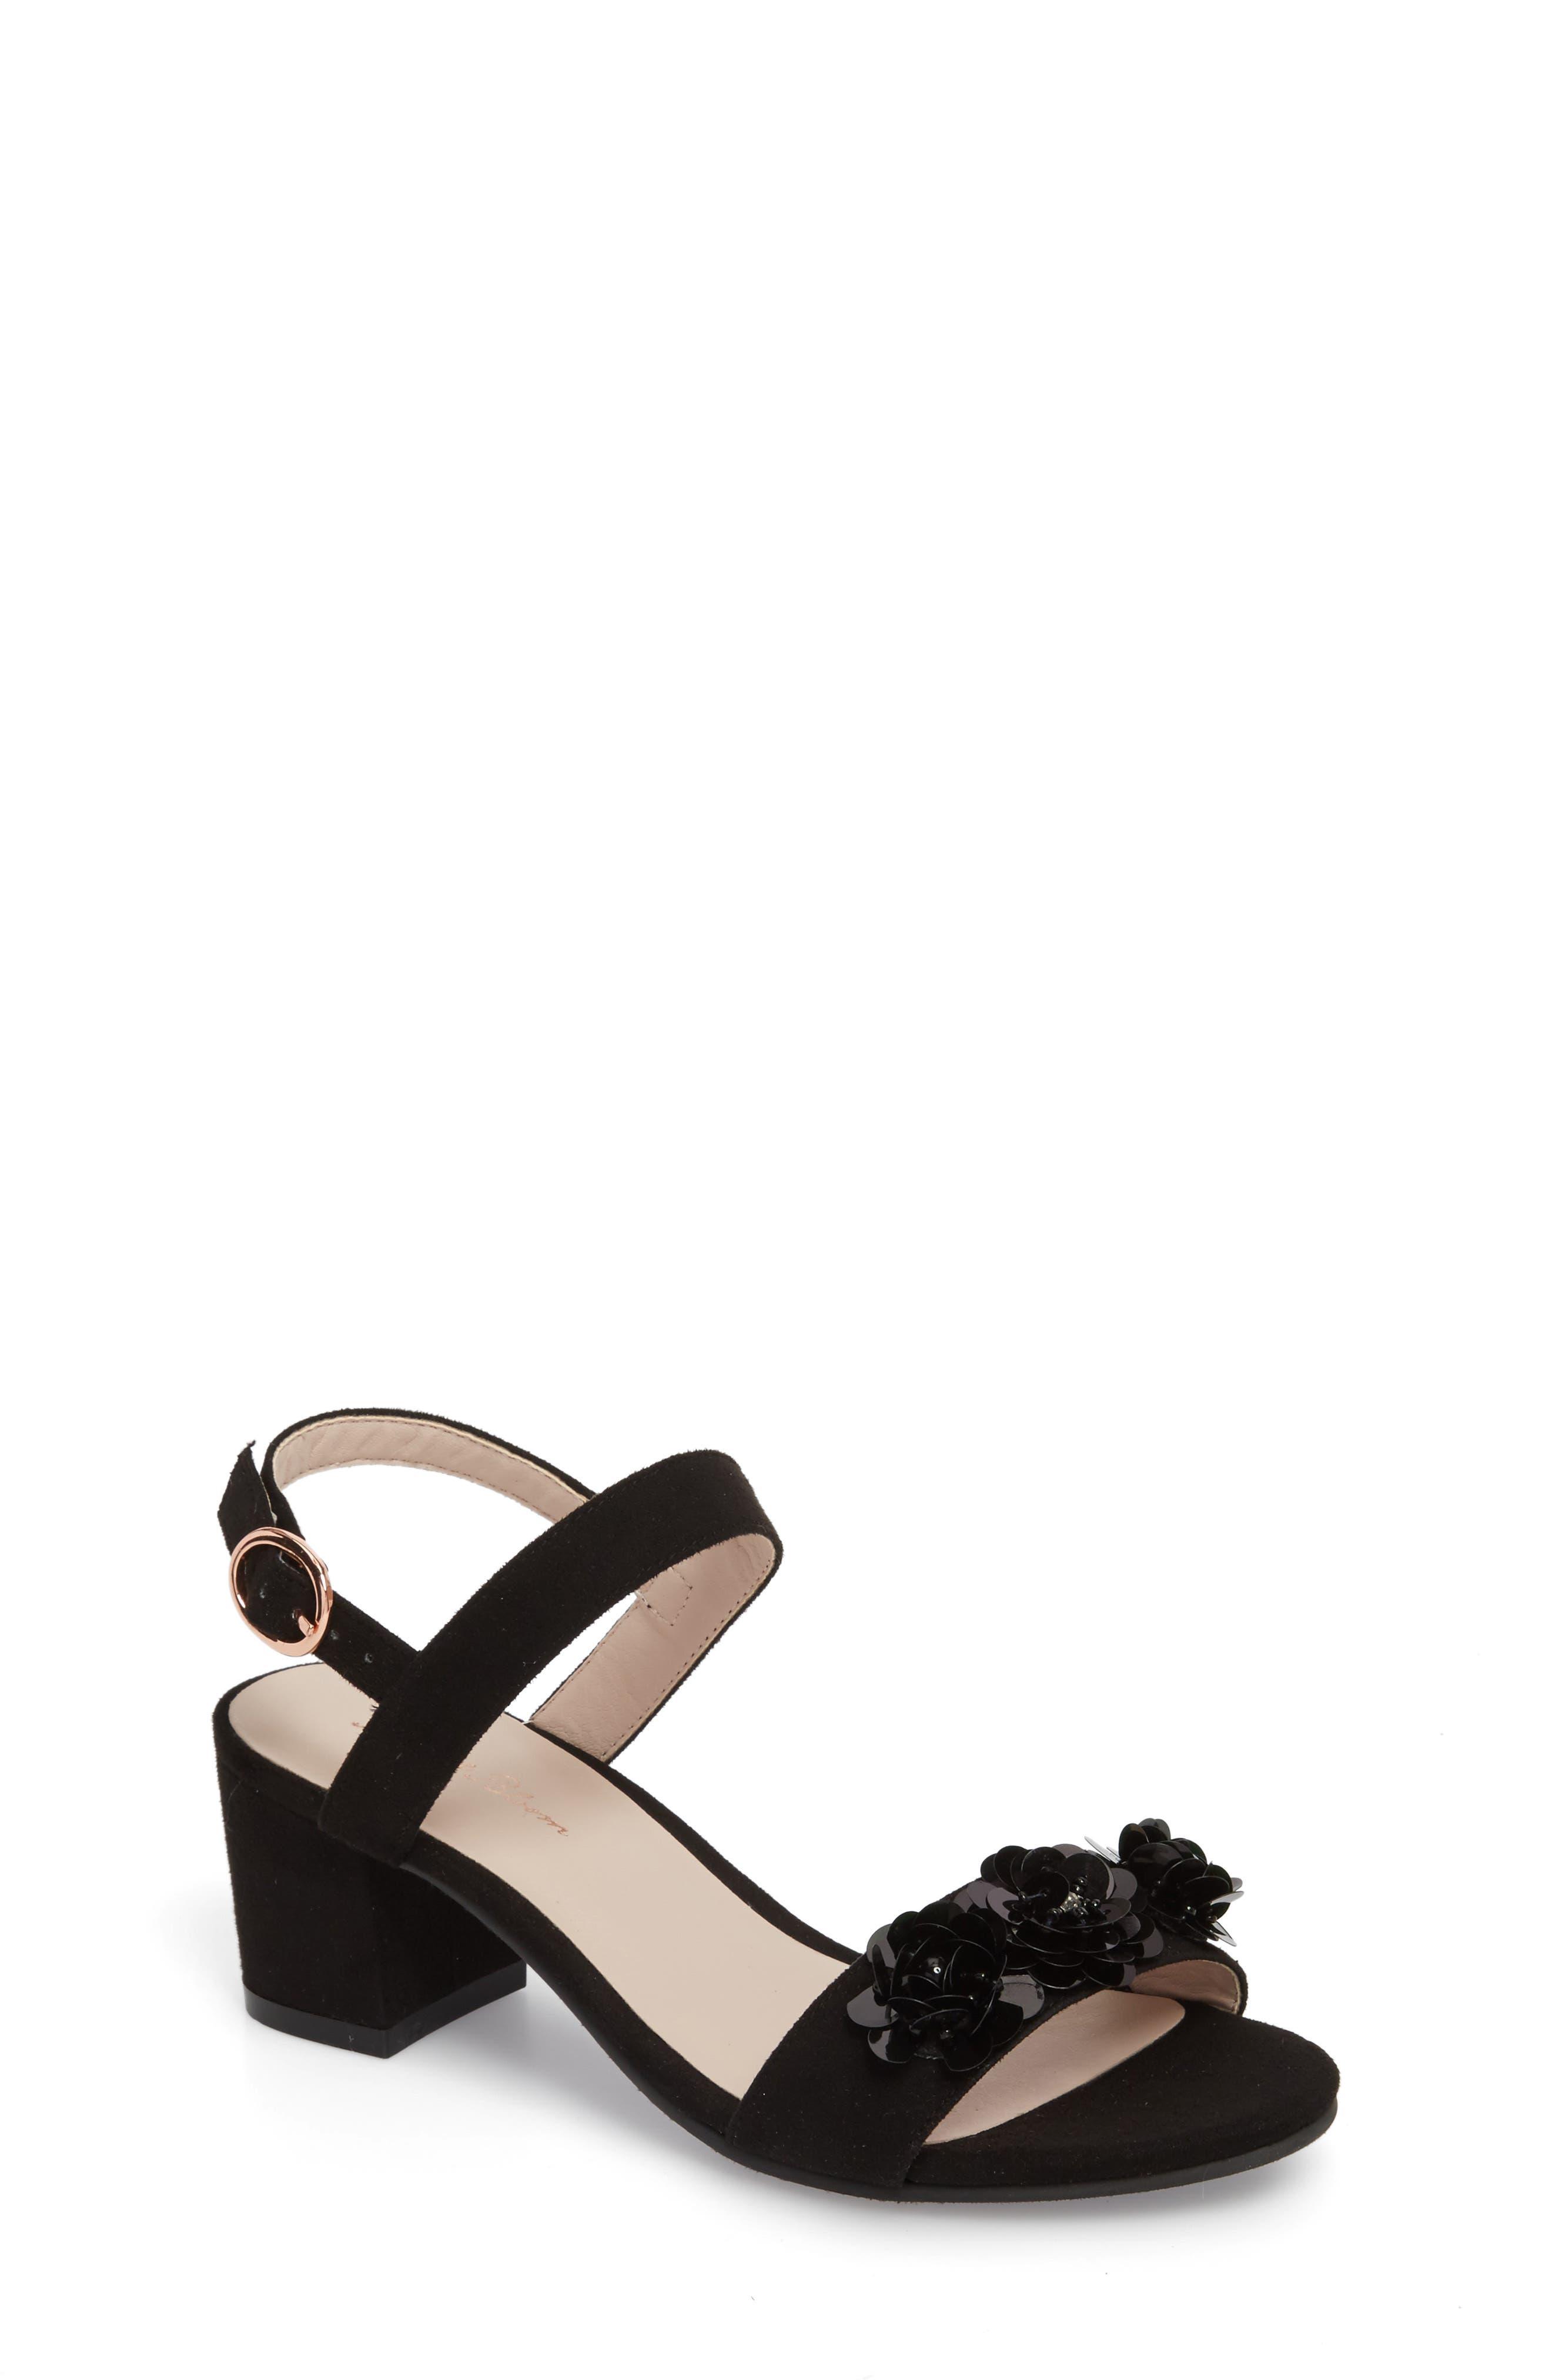 Dina Floral Embellished Sandal,                             Main thumbnail 1, color,                             Black Fabric